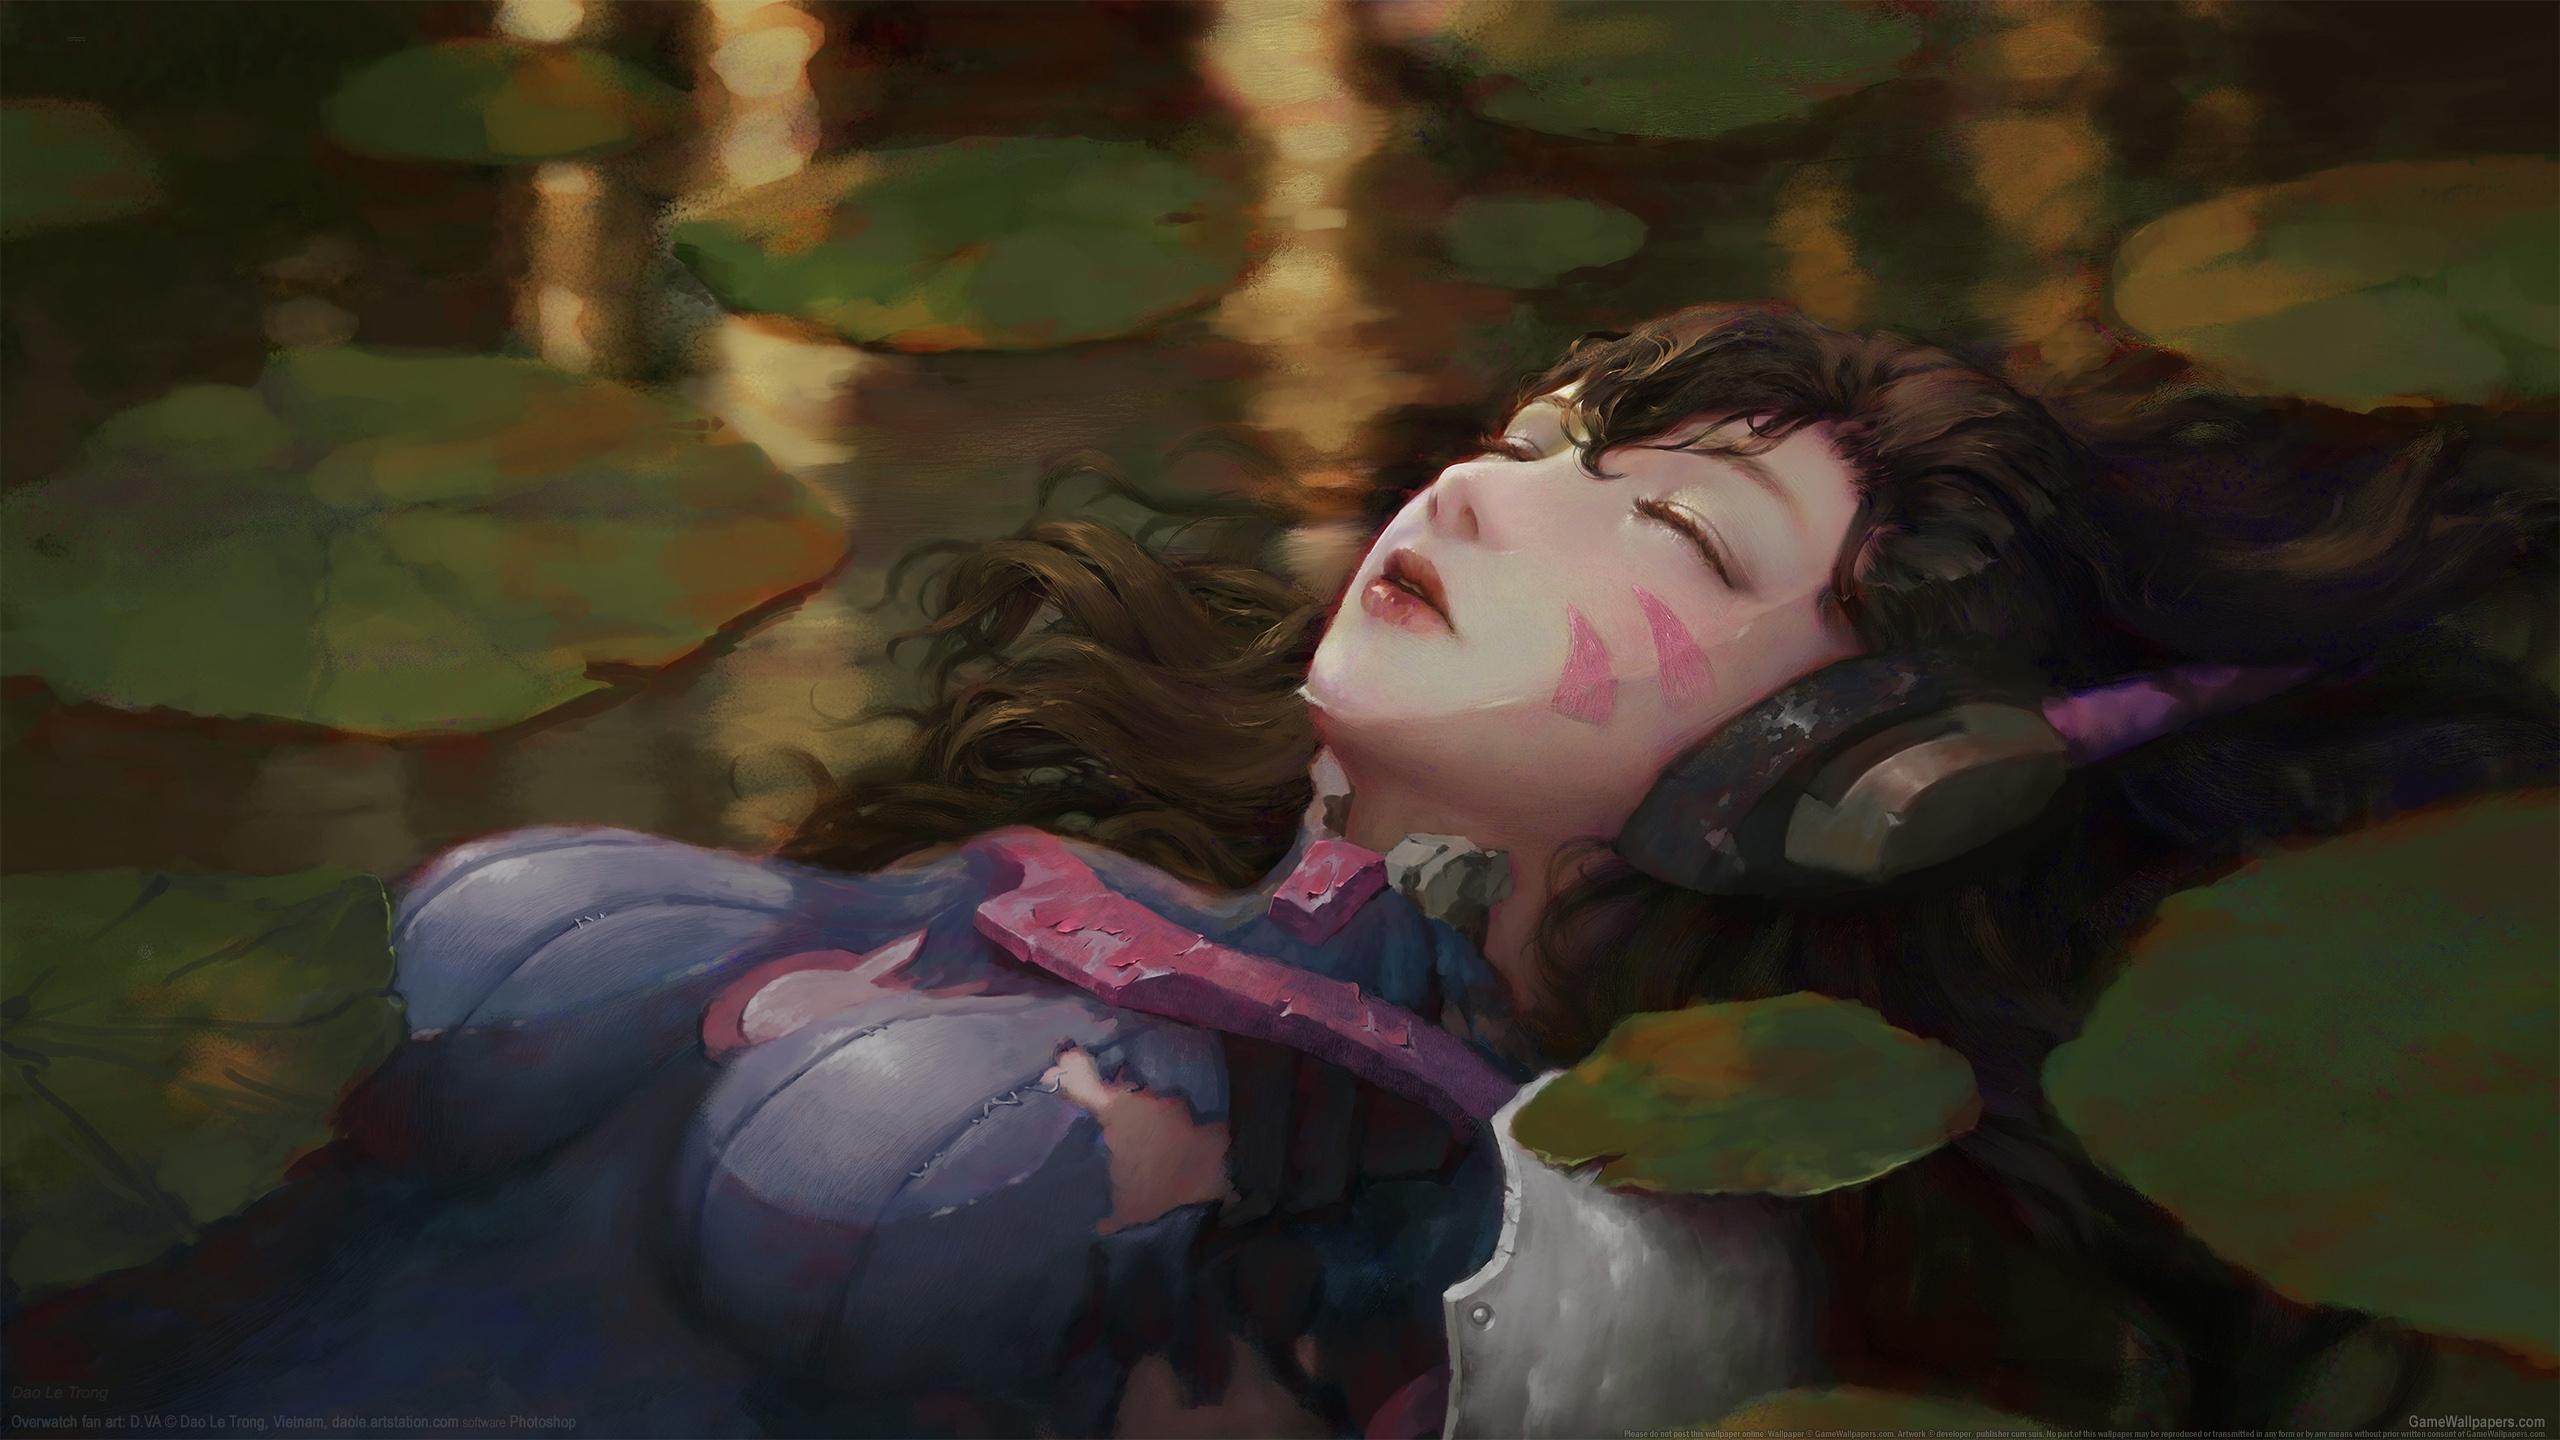 Overwatch fan art 2560x1440 fond d'écran 02